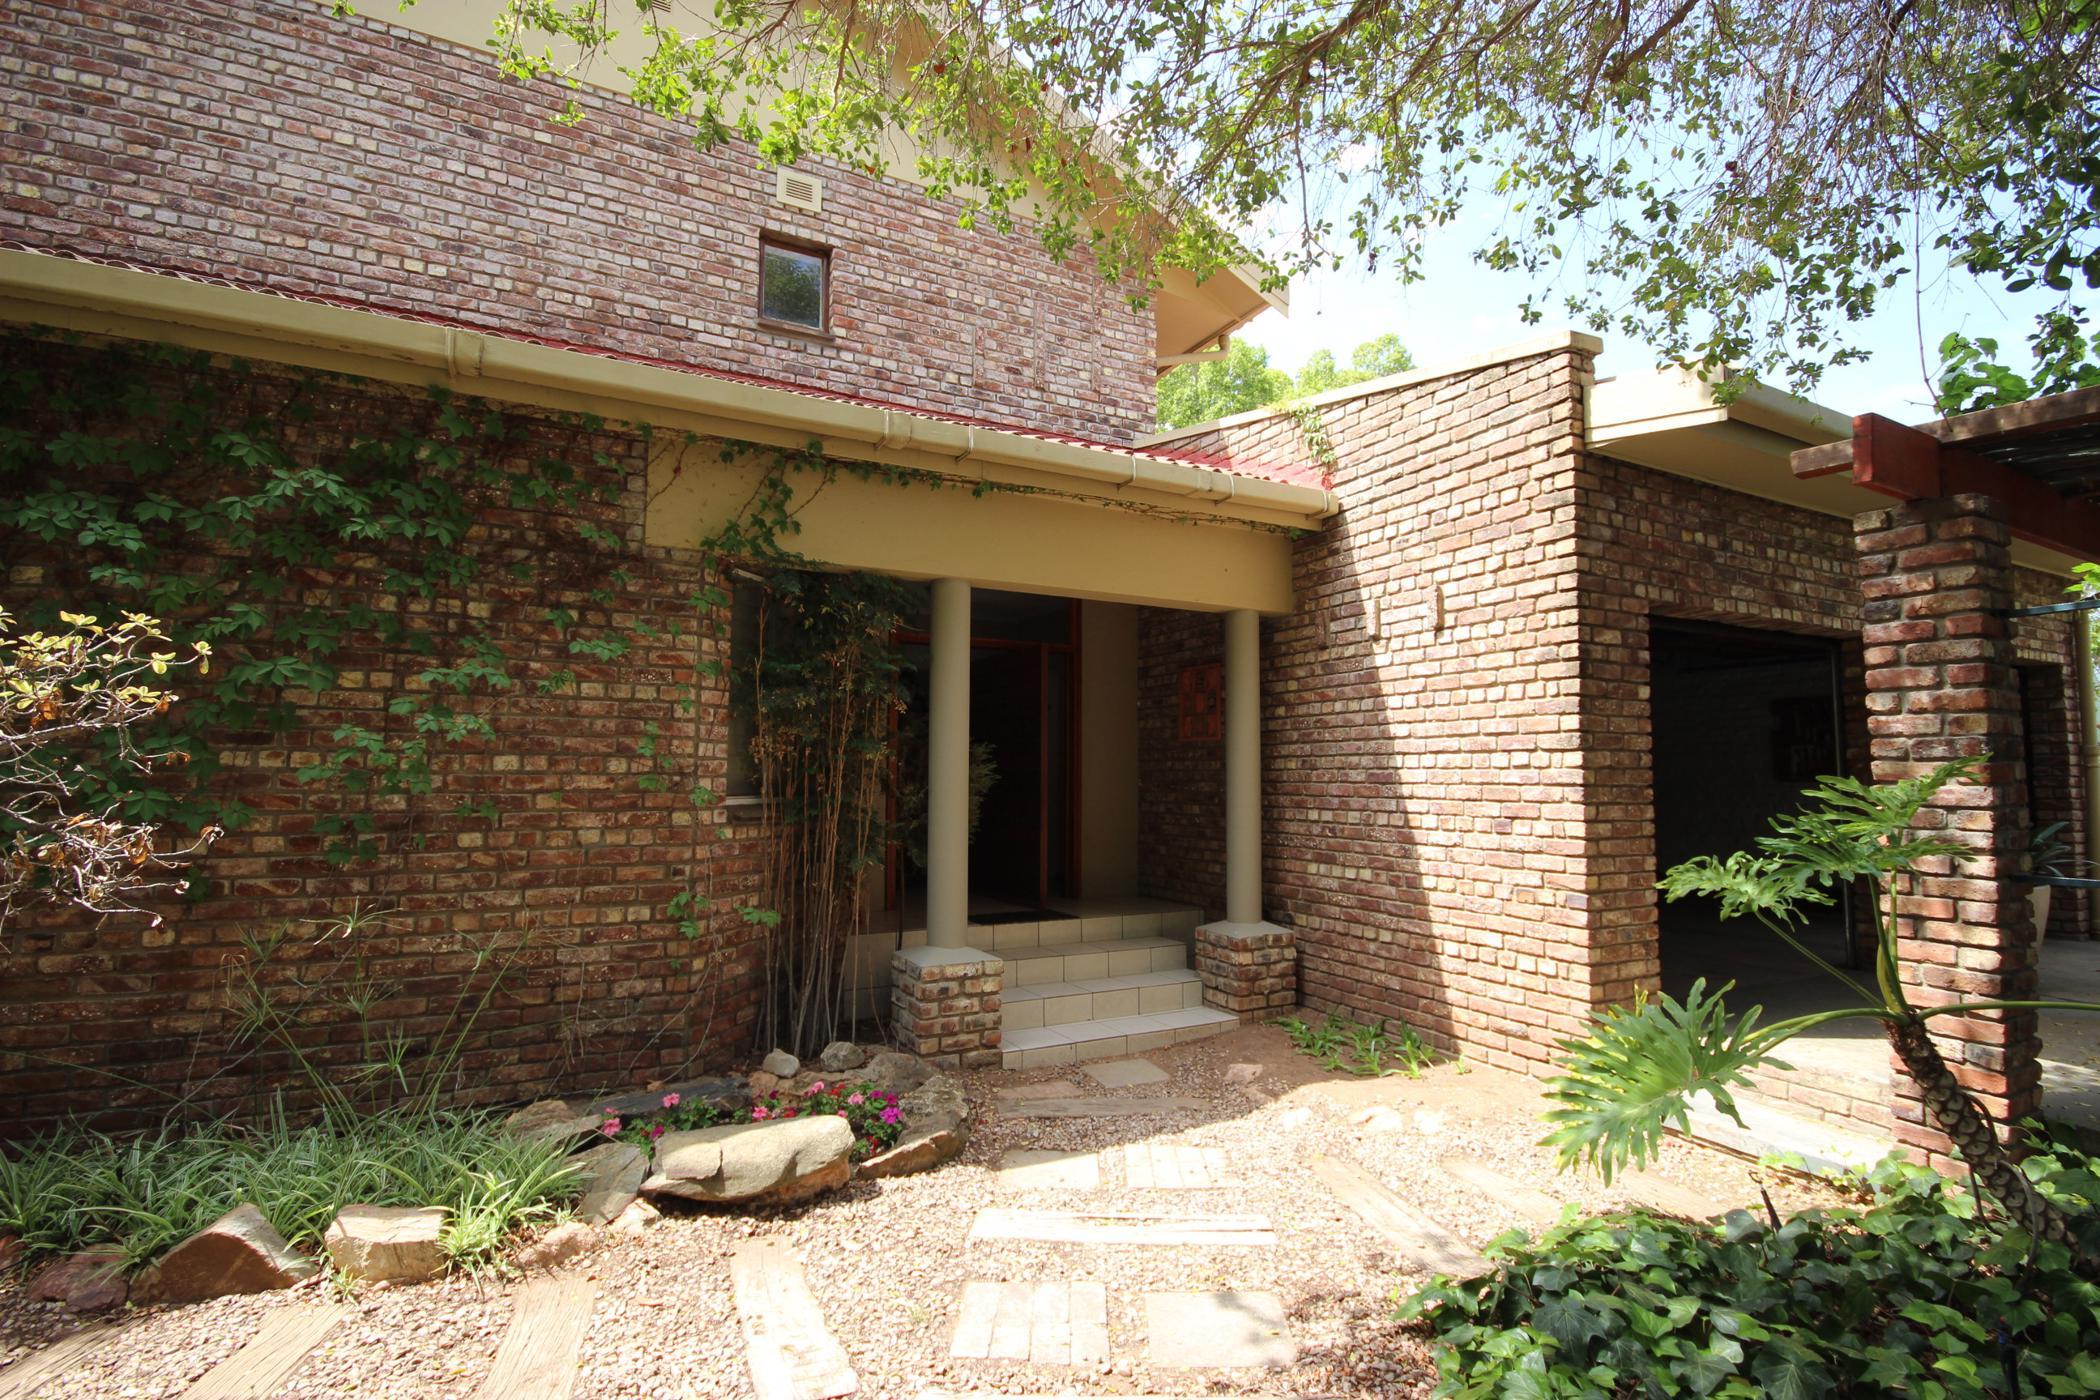 5 bedroom house for sale in West Bank (Oudtshoorn)